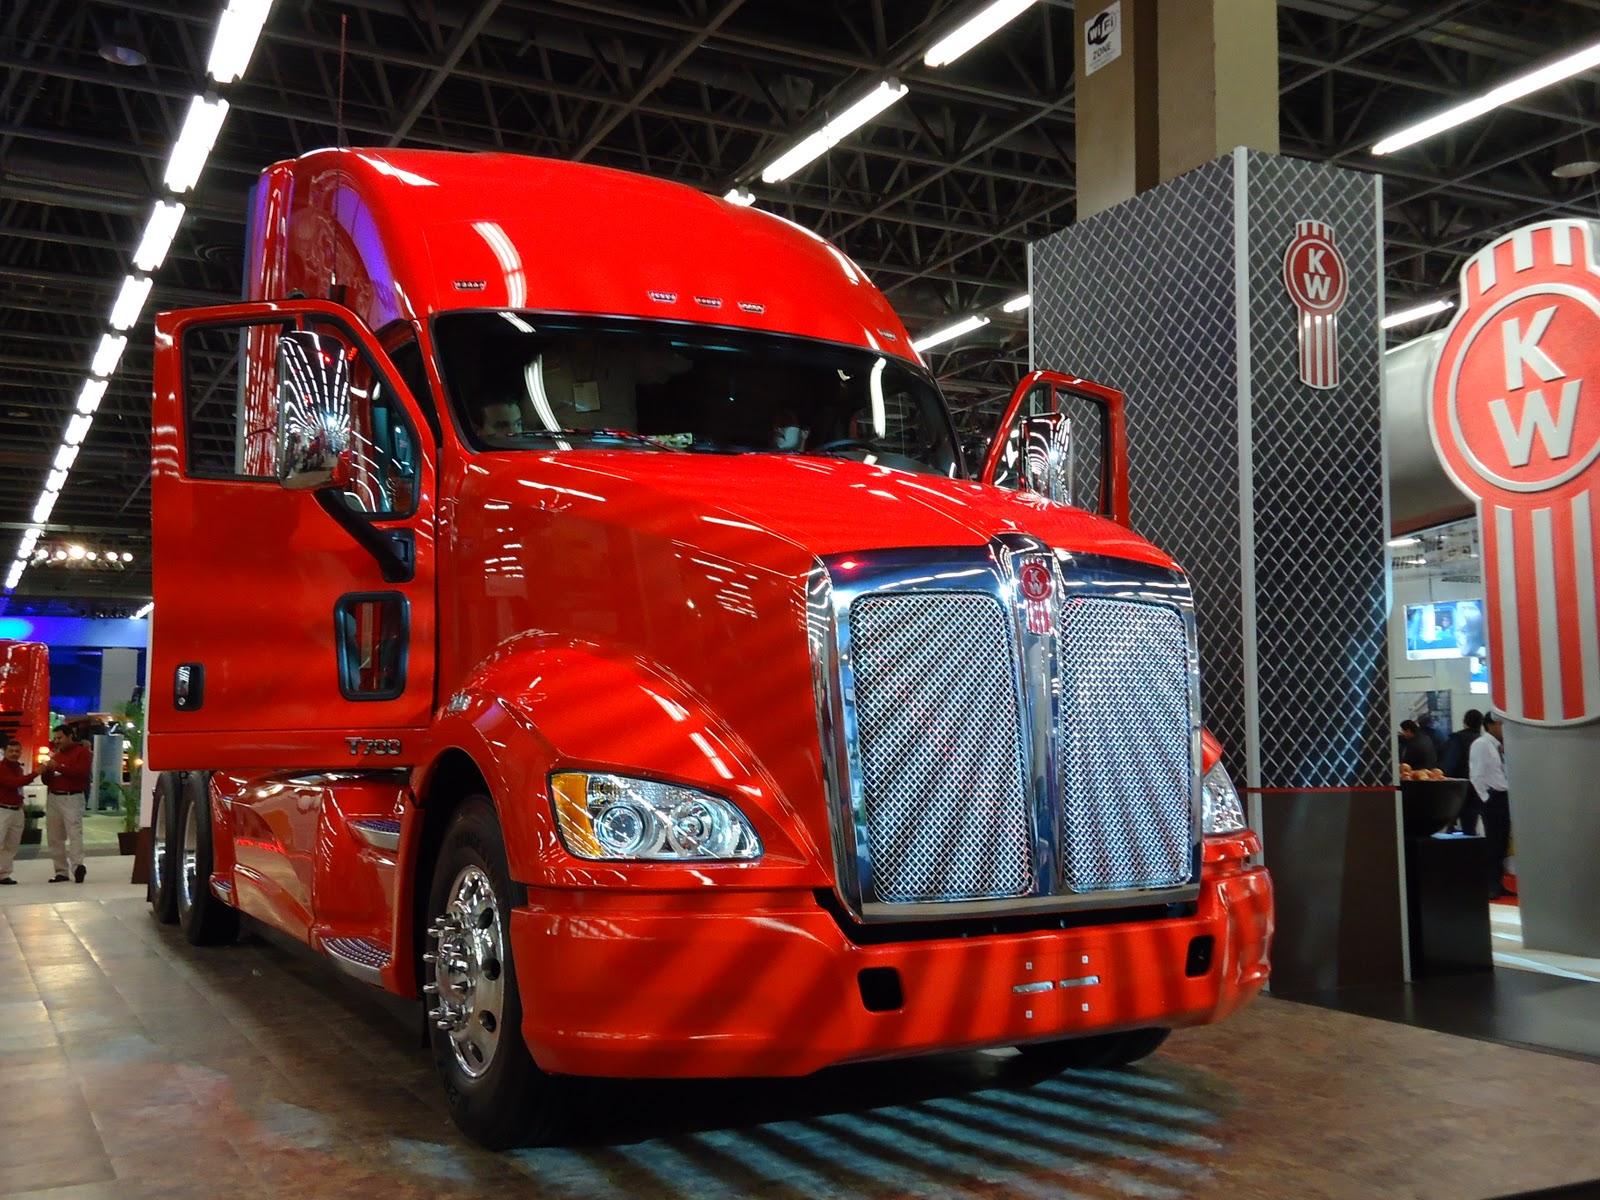 Camion KW rojo